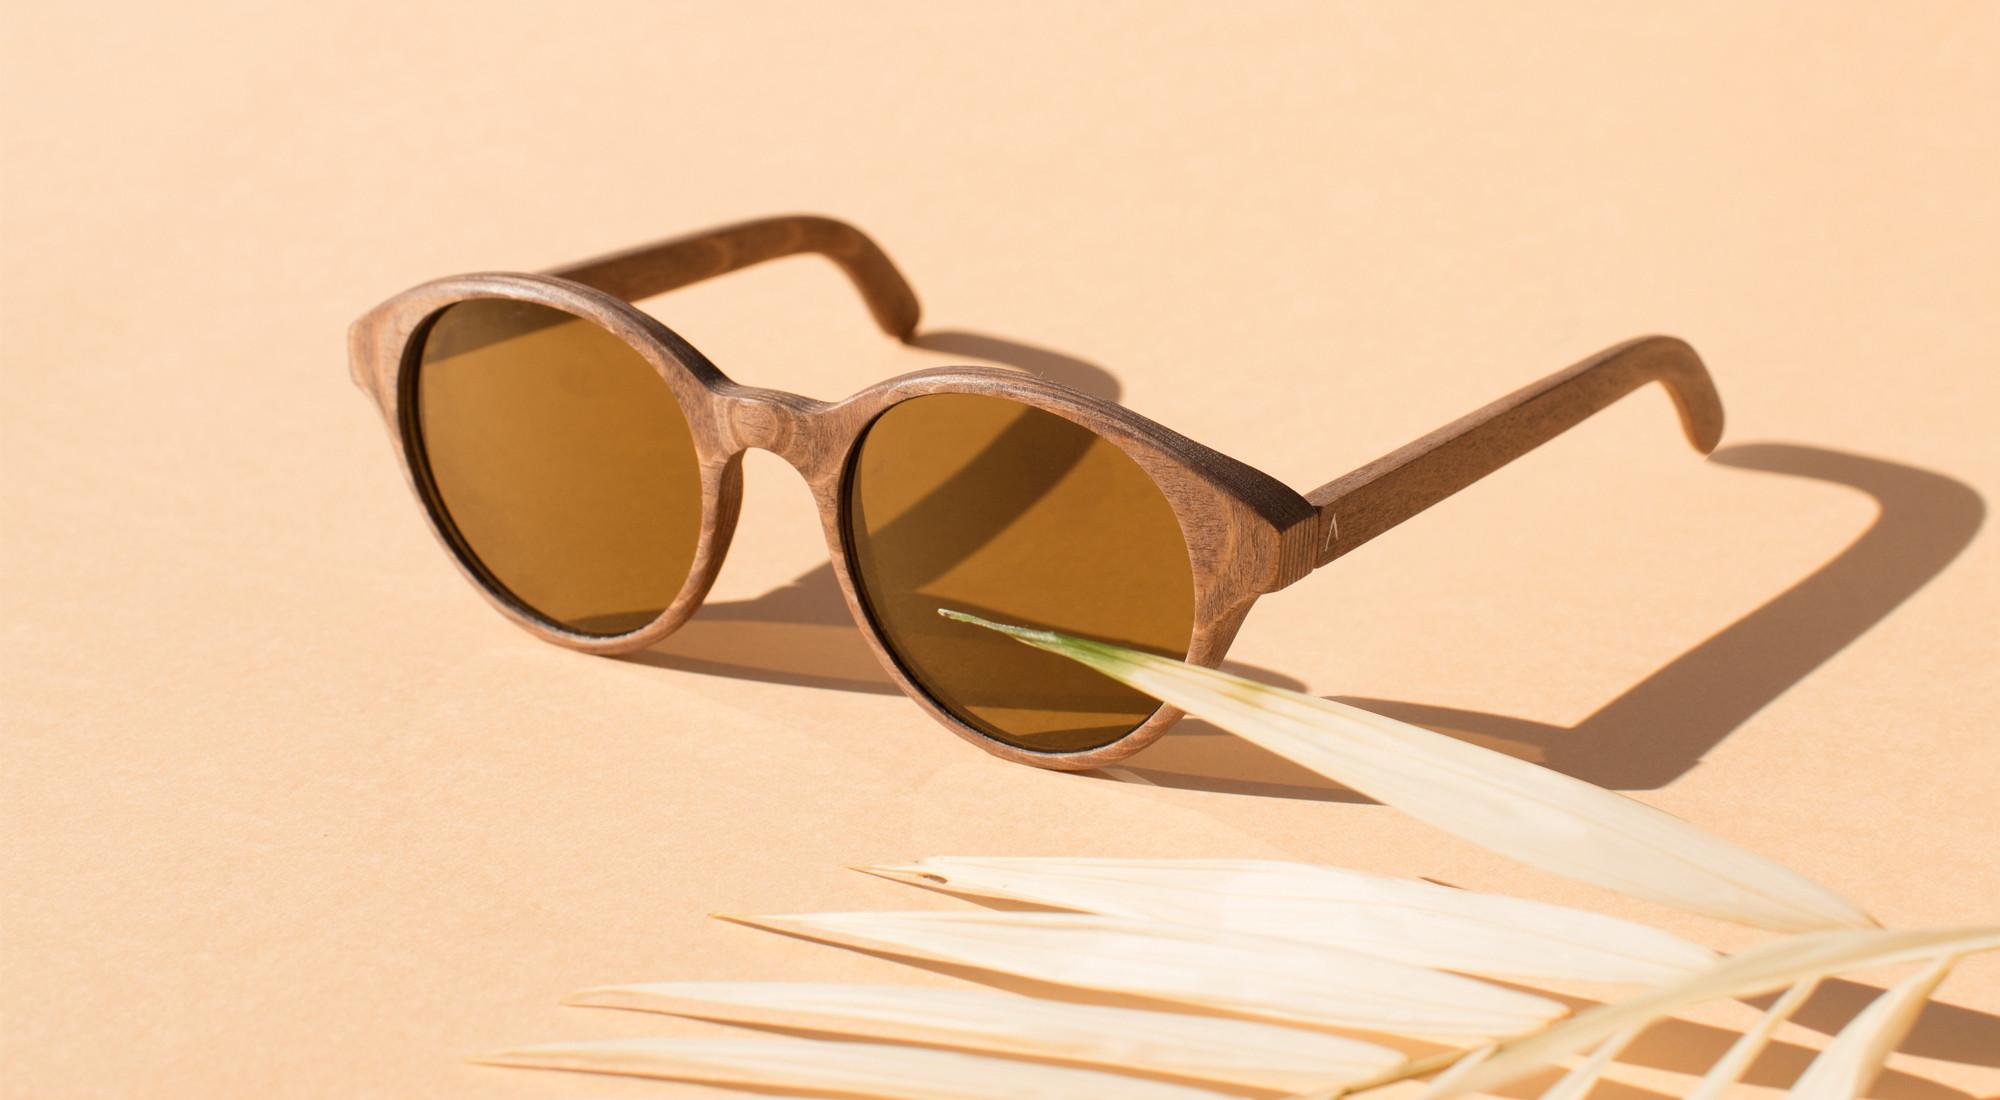 48df267b31 Enlite  Αυτά τα ελληνικά ξύλινα γυαλιά δεν έχουν καμία σχέση με όλα ...